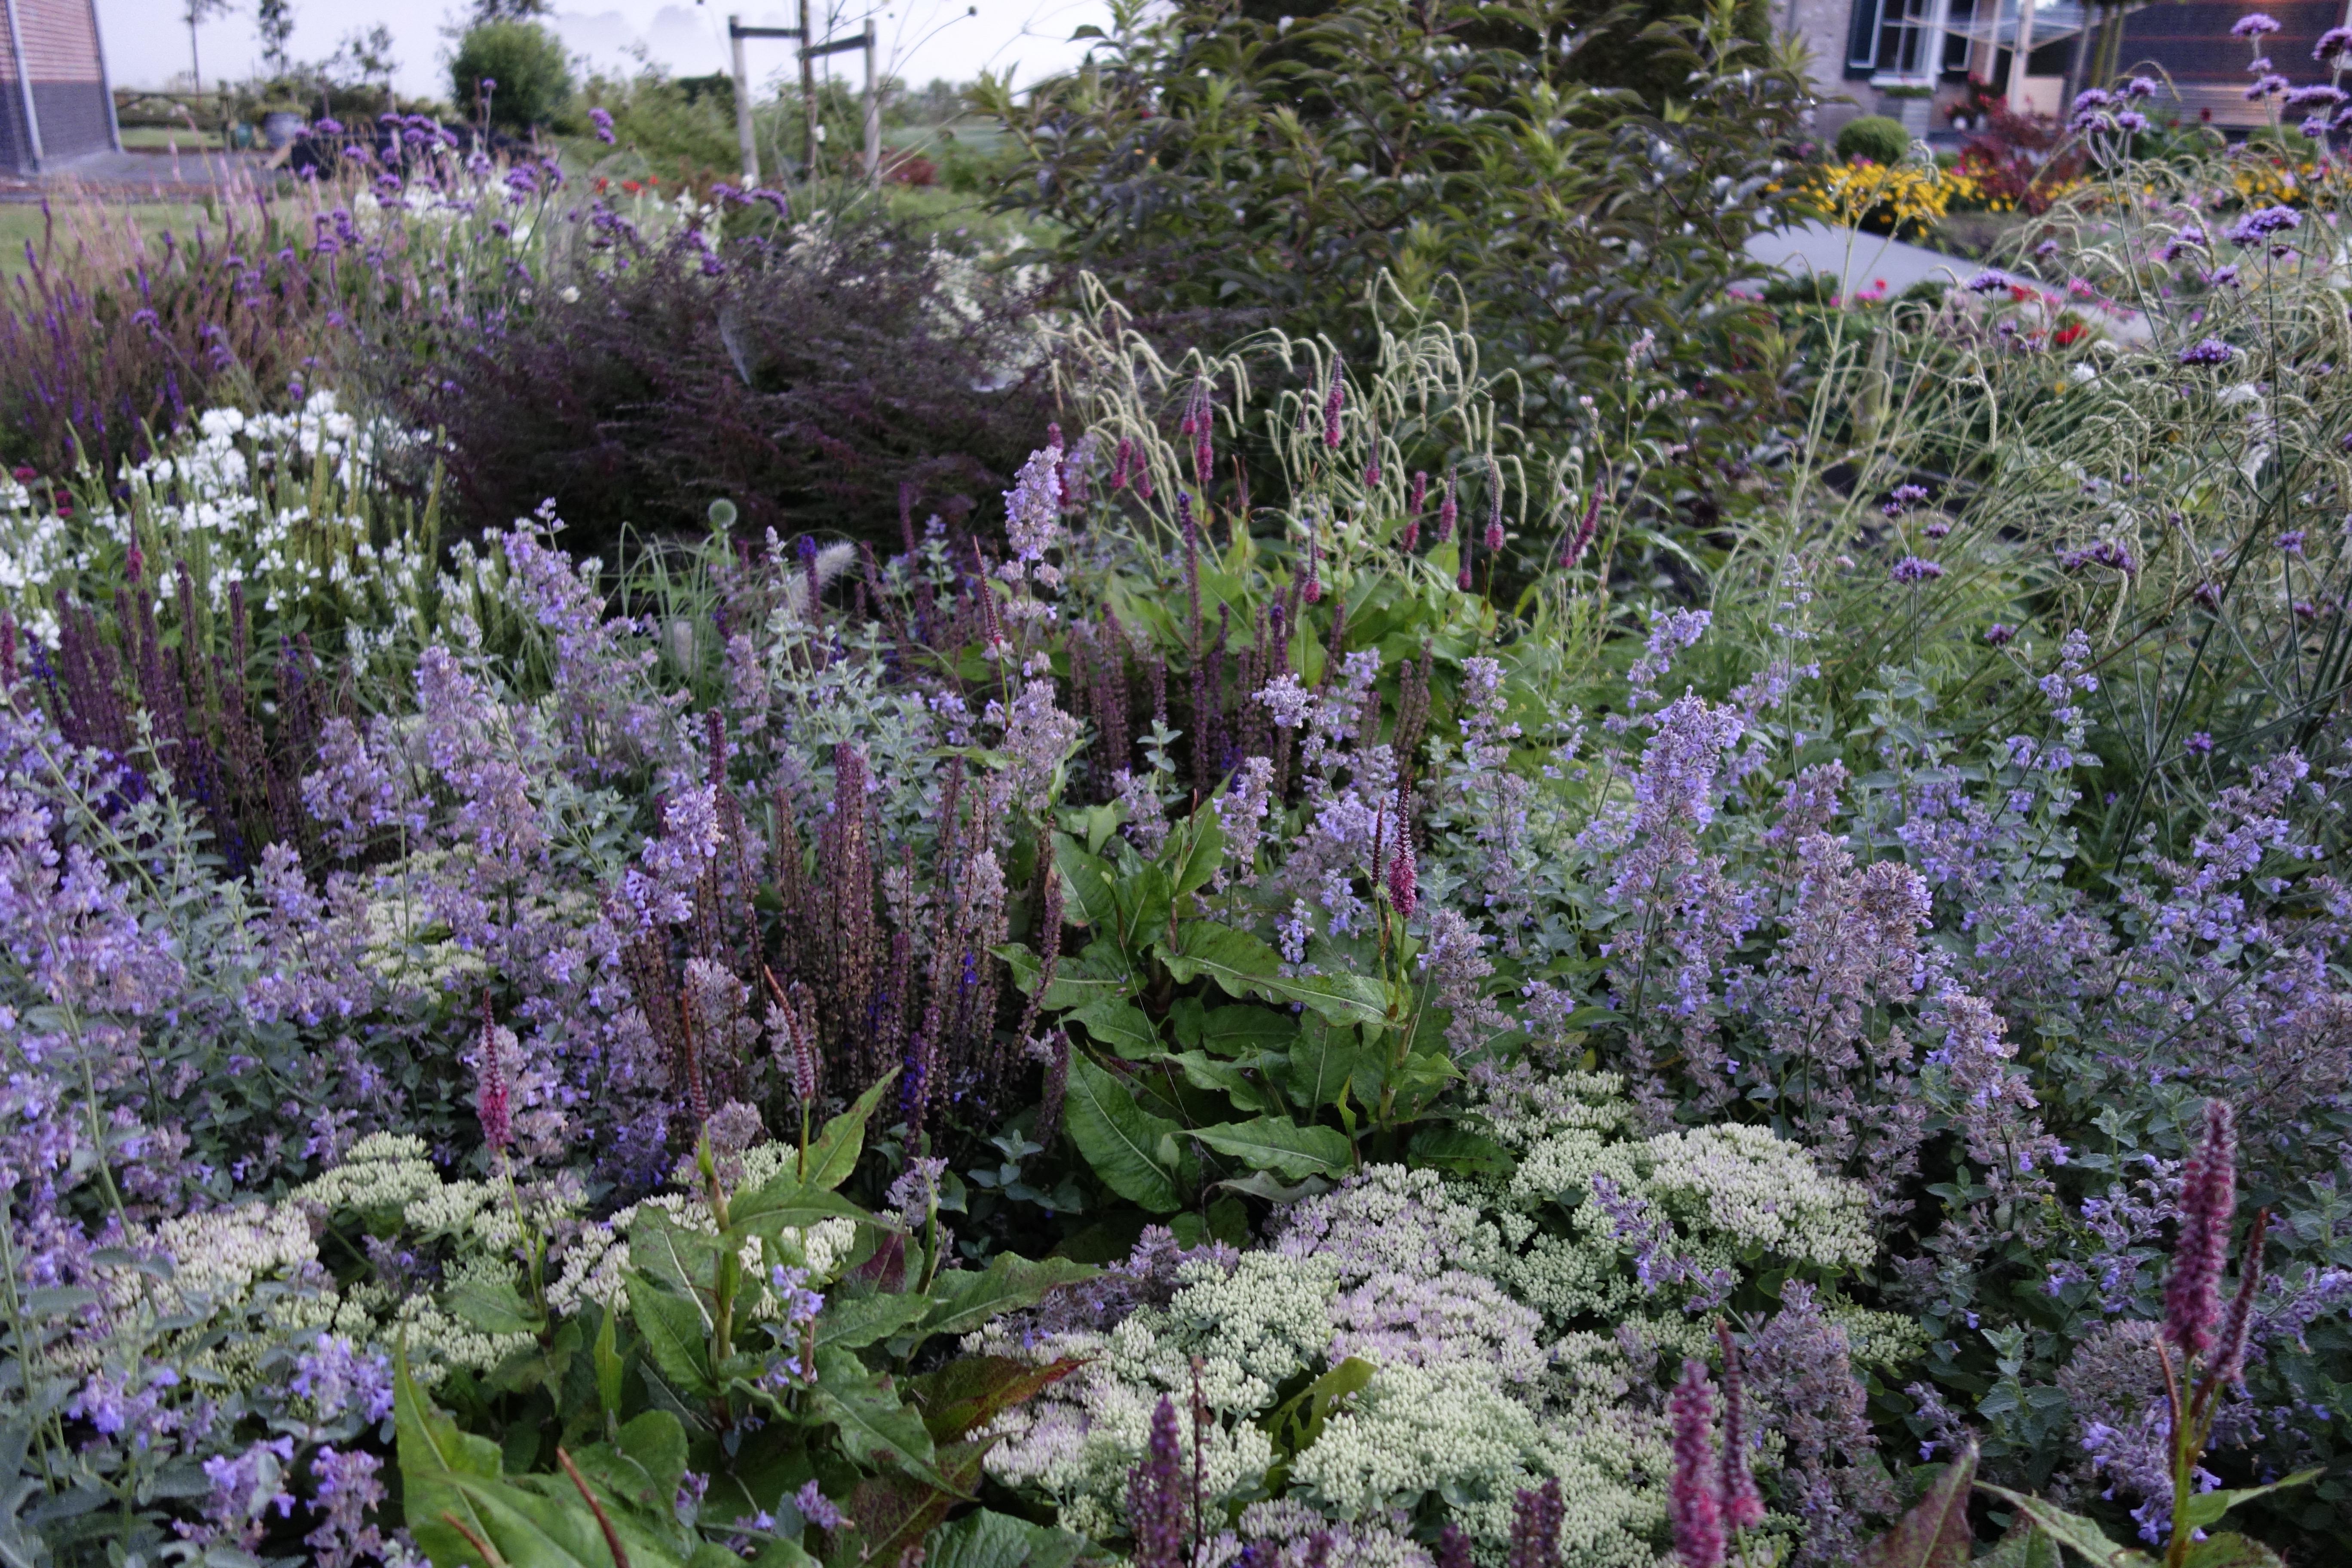 border paars roze lila wit vlinders bijen